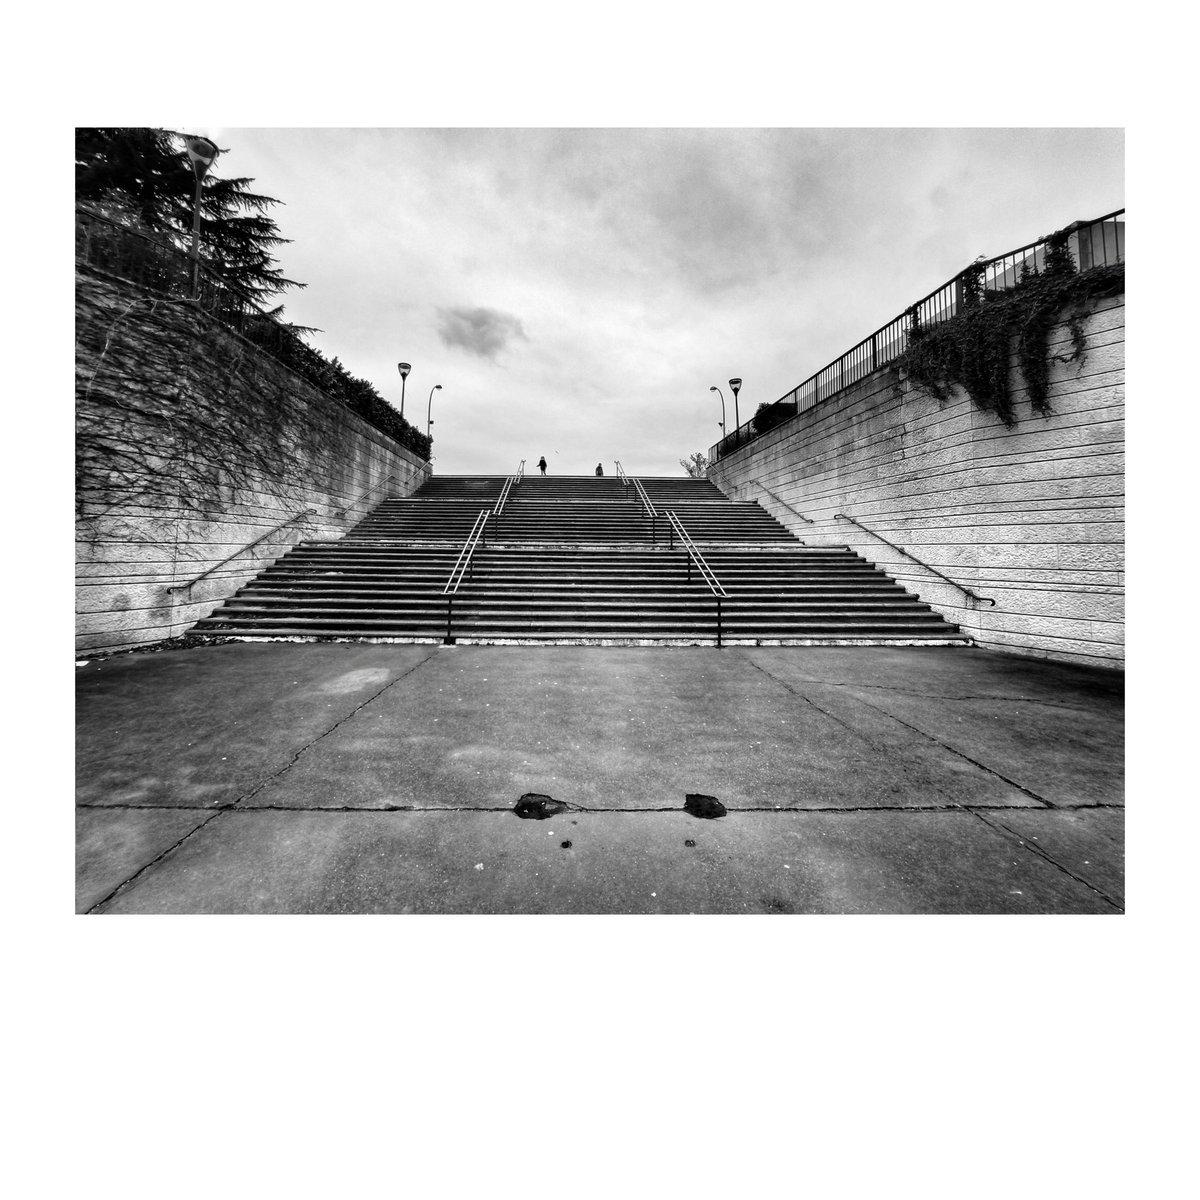 Les marches (Fontenay-sous-bois, Février 2020)  #websta #picoftheday #photooftheday #igers #instalike #photogrid #snapseed #snapseedshot #picsart #photography #photographie #xiaomi #marches #escaliers #fontenaysousbois #stadeletiec #bfxtg